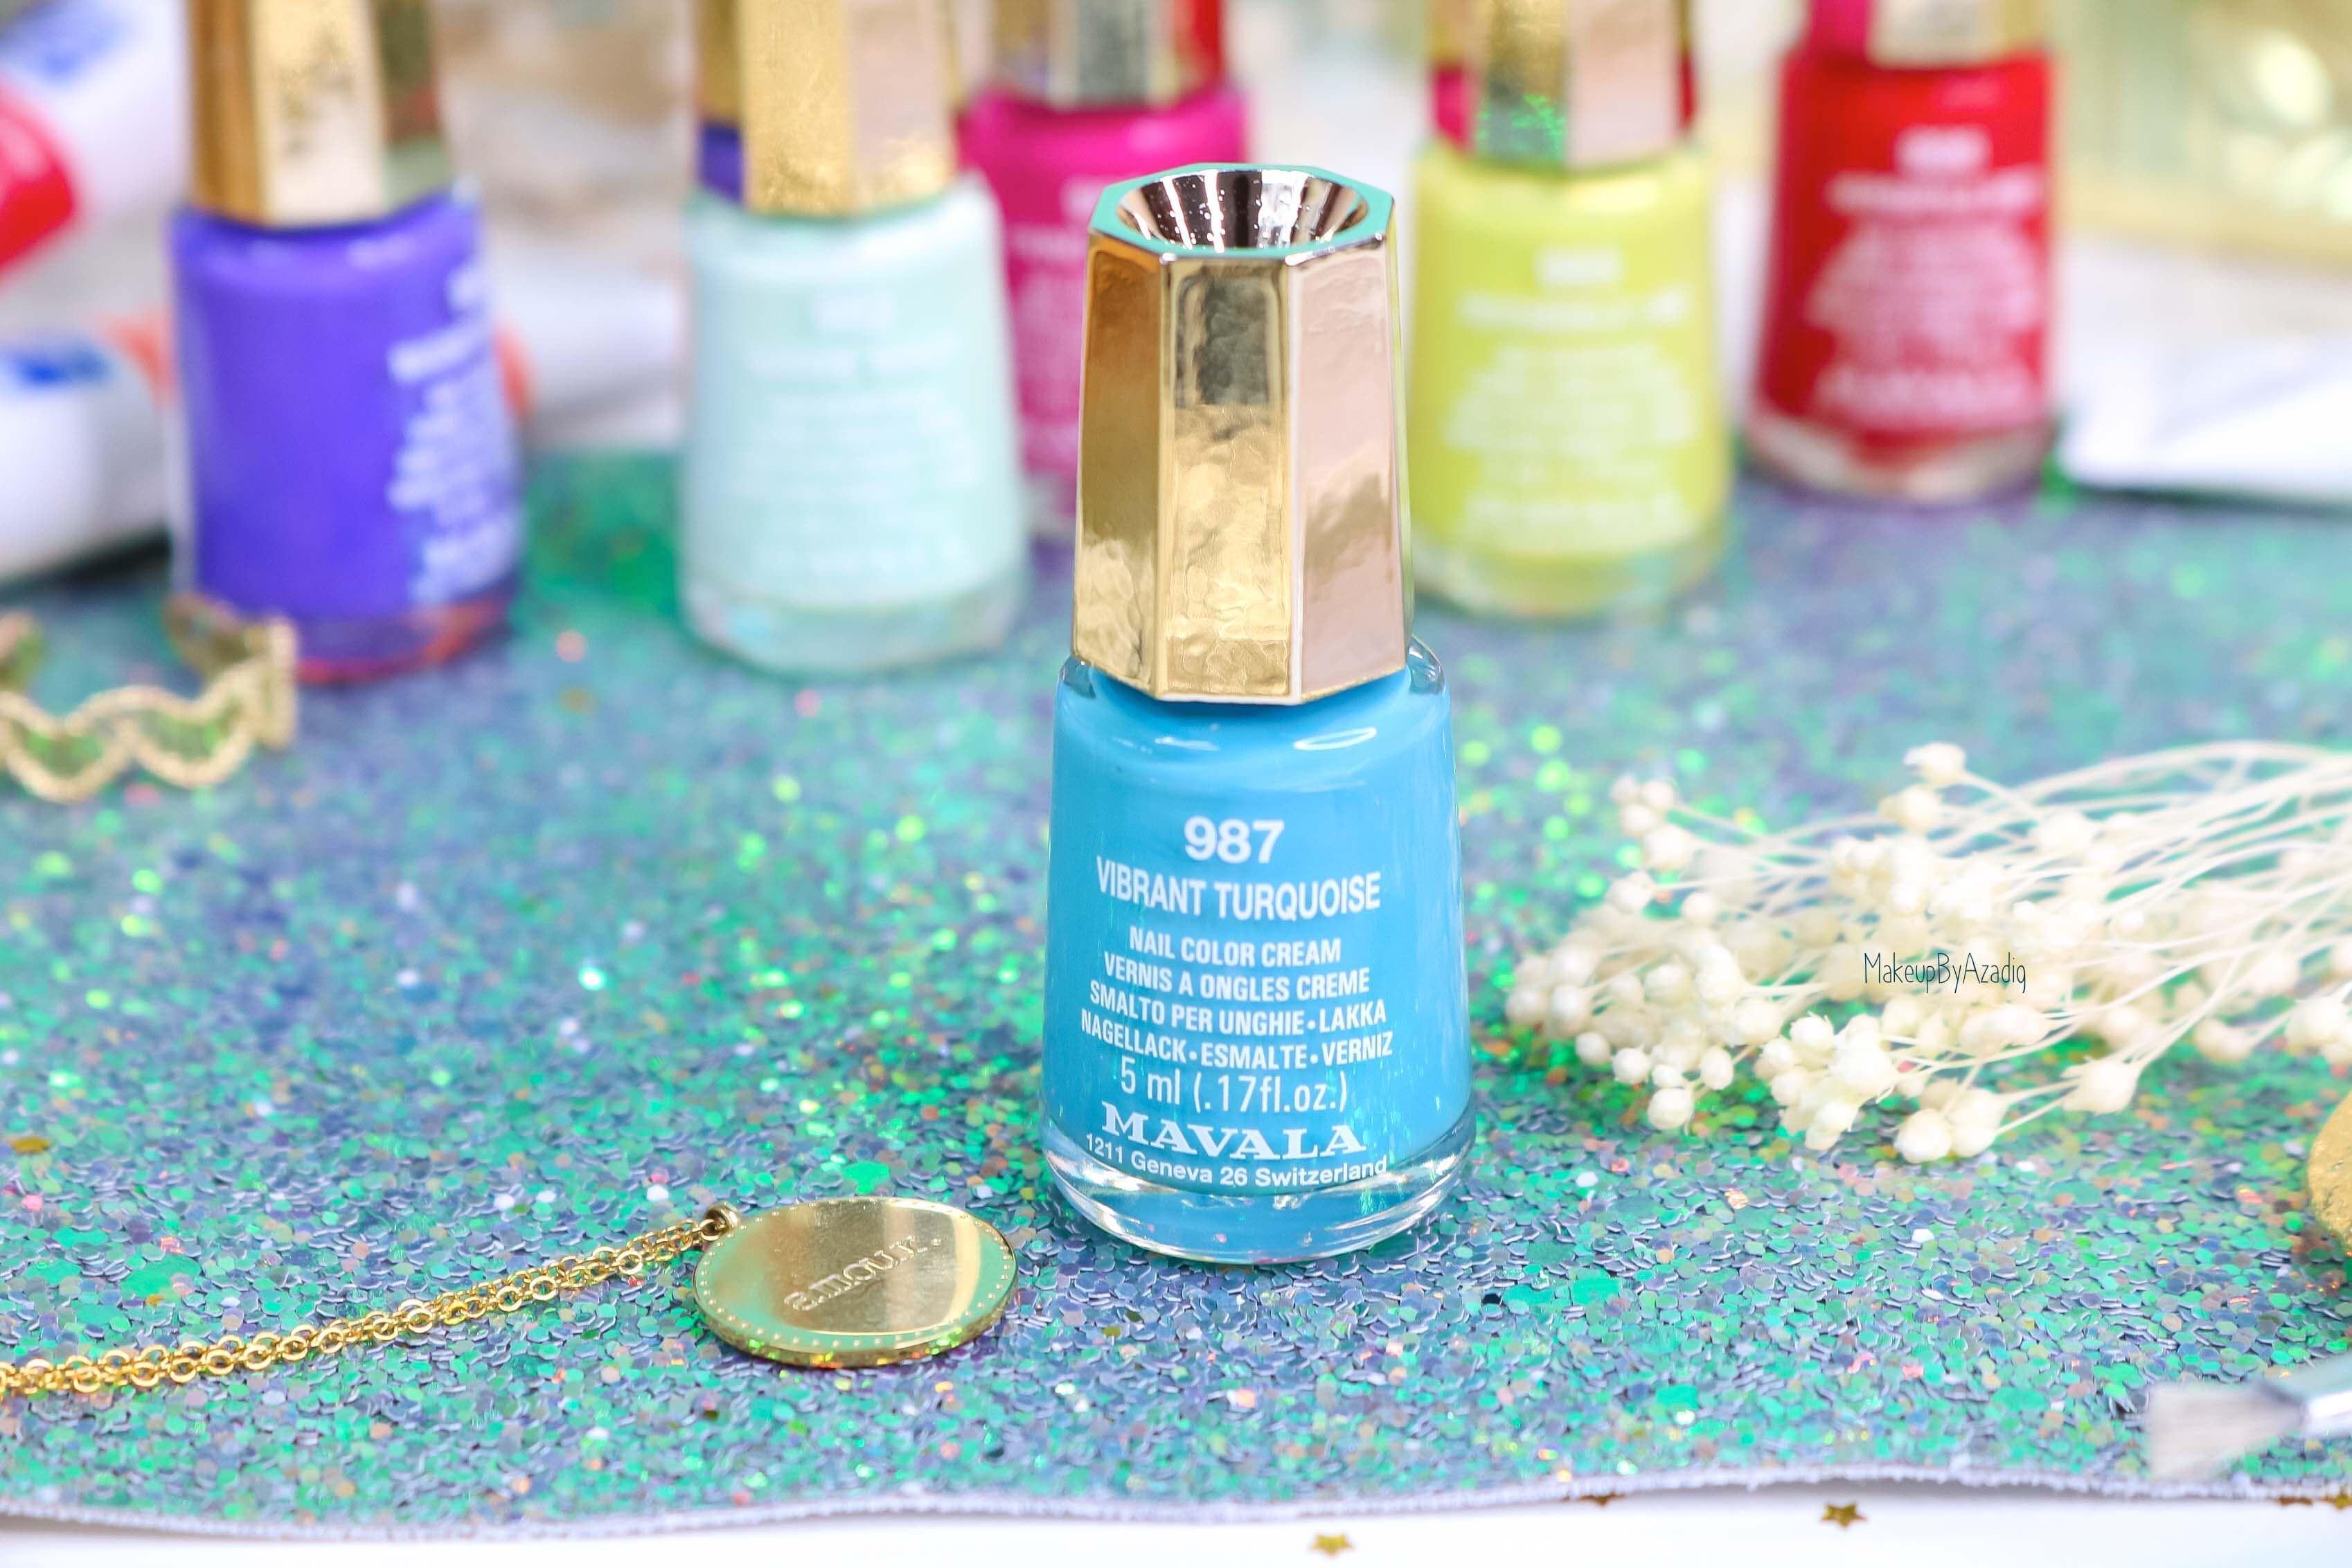 revue-collection-vernis-mavala-nails-dash-splash-ete-2019-bleu-orange-makeupbyazadig-swatch-avis-prix-turquoise